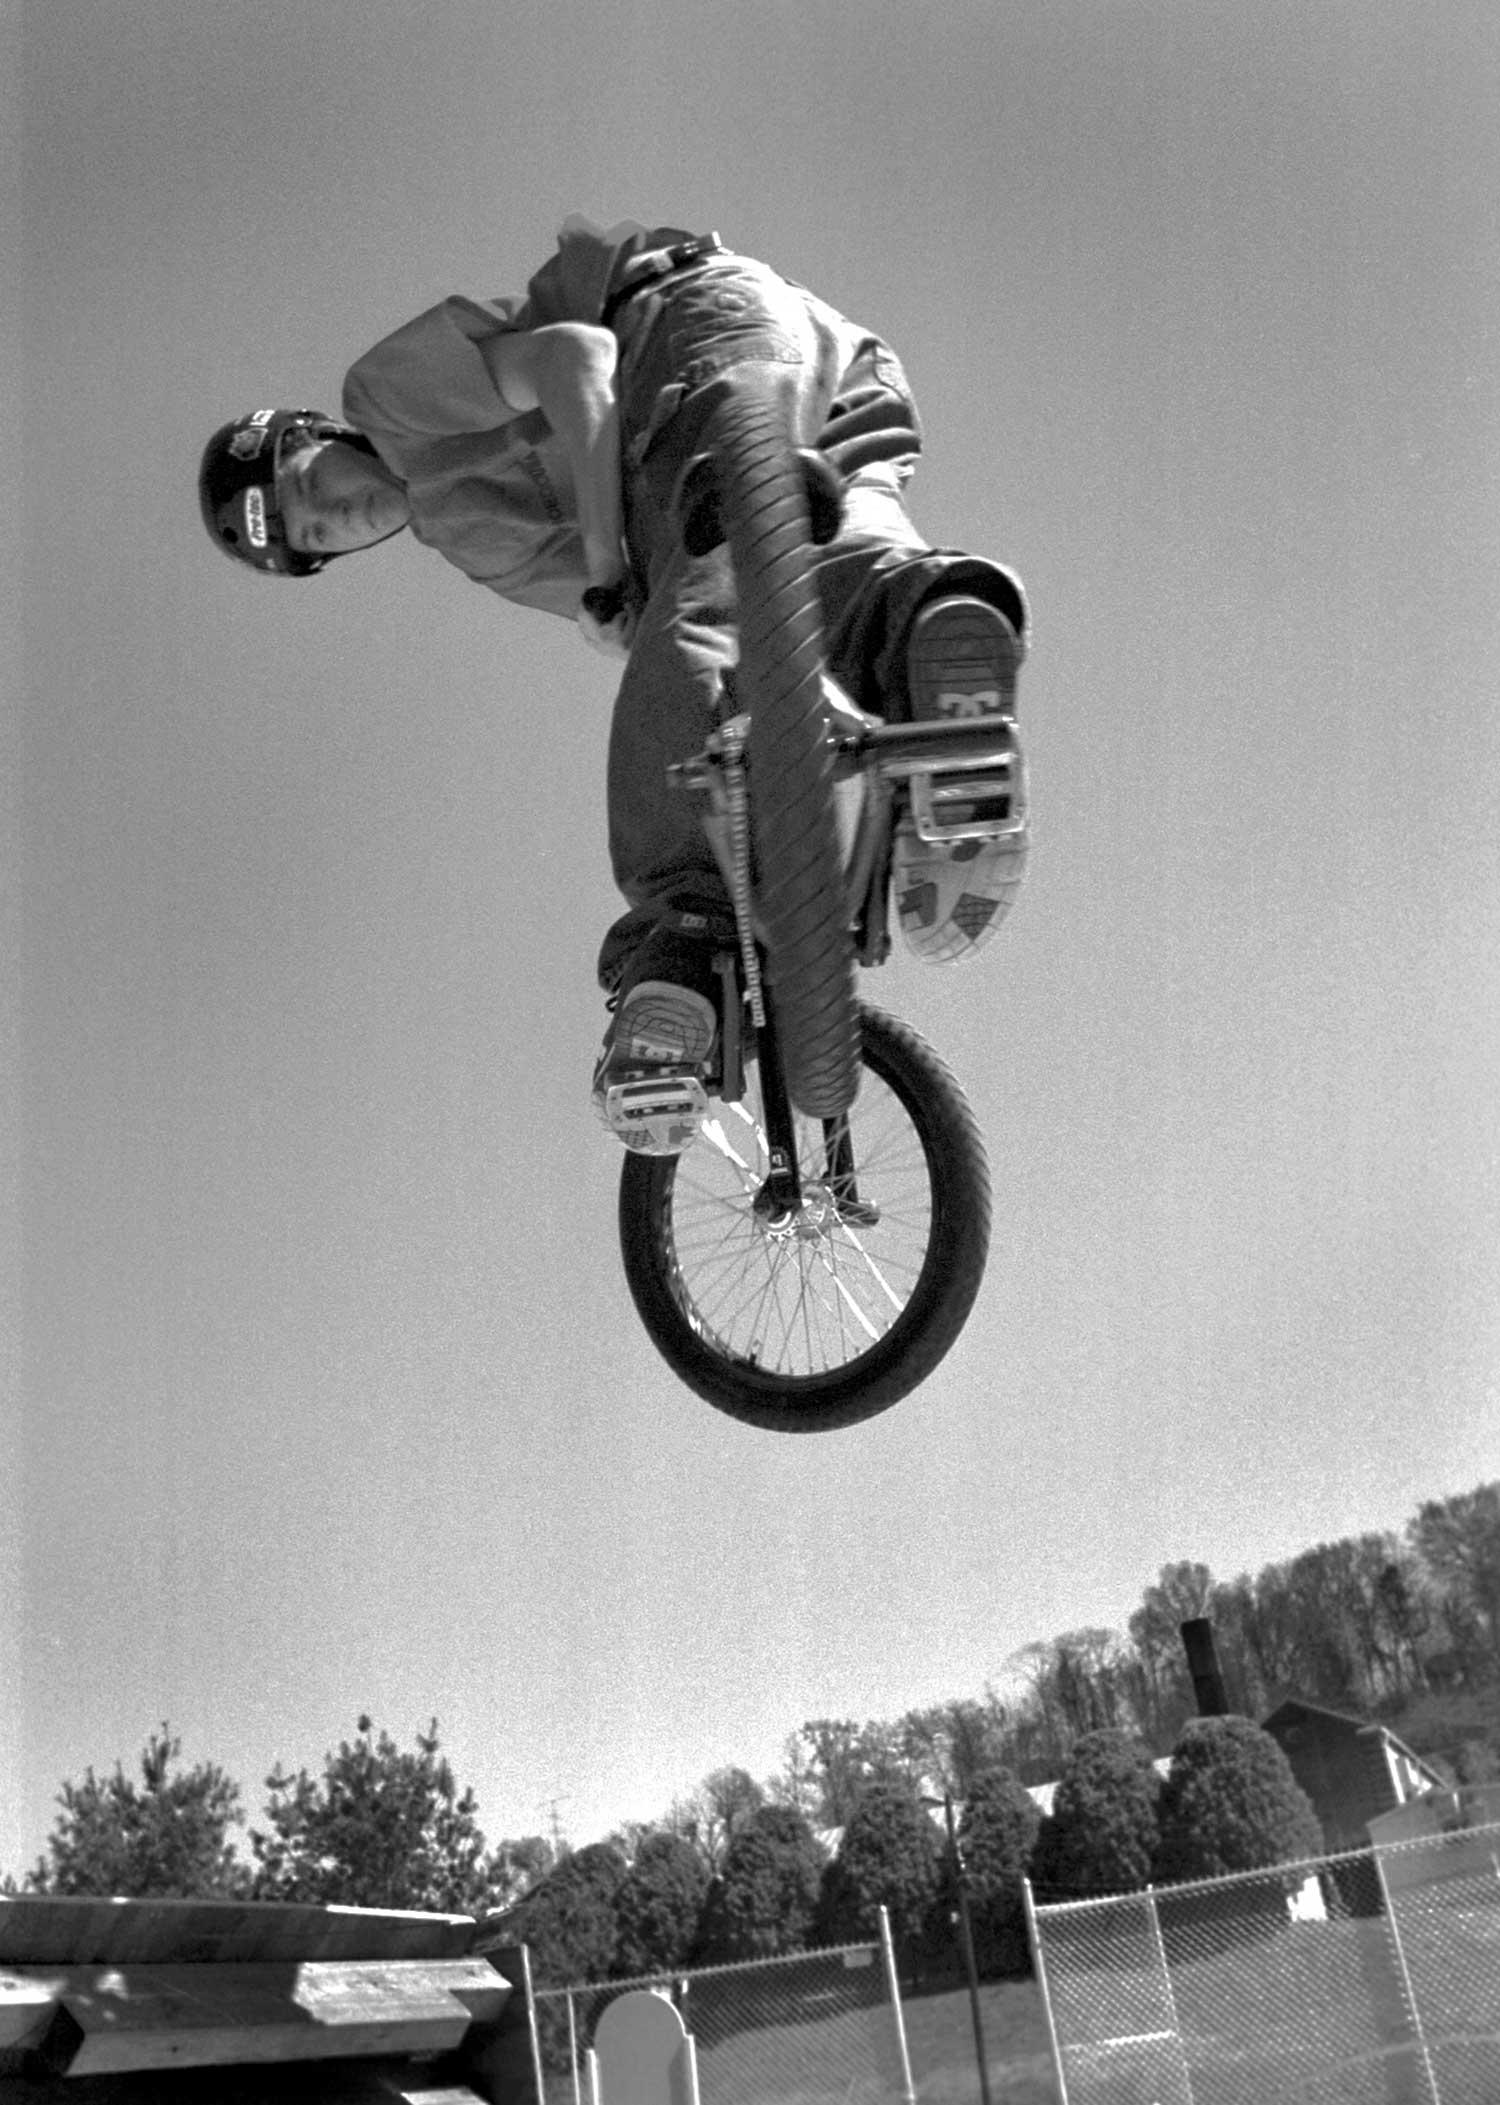 Jerry Bitterlick looks to nail the landing. photo by Matt Vodraska - 2004